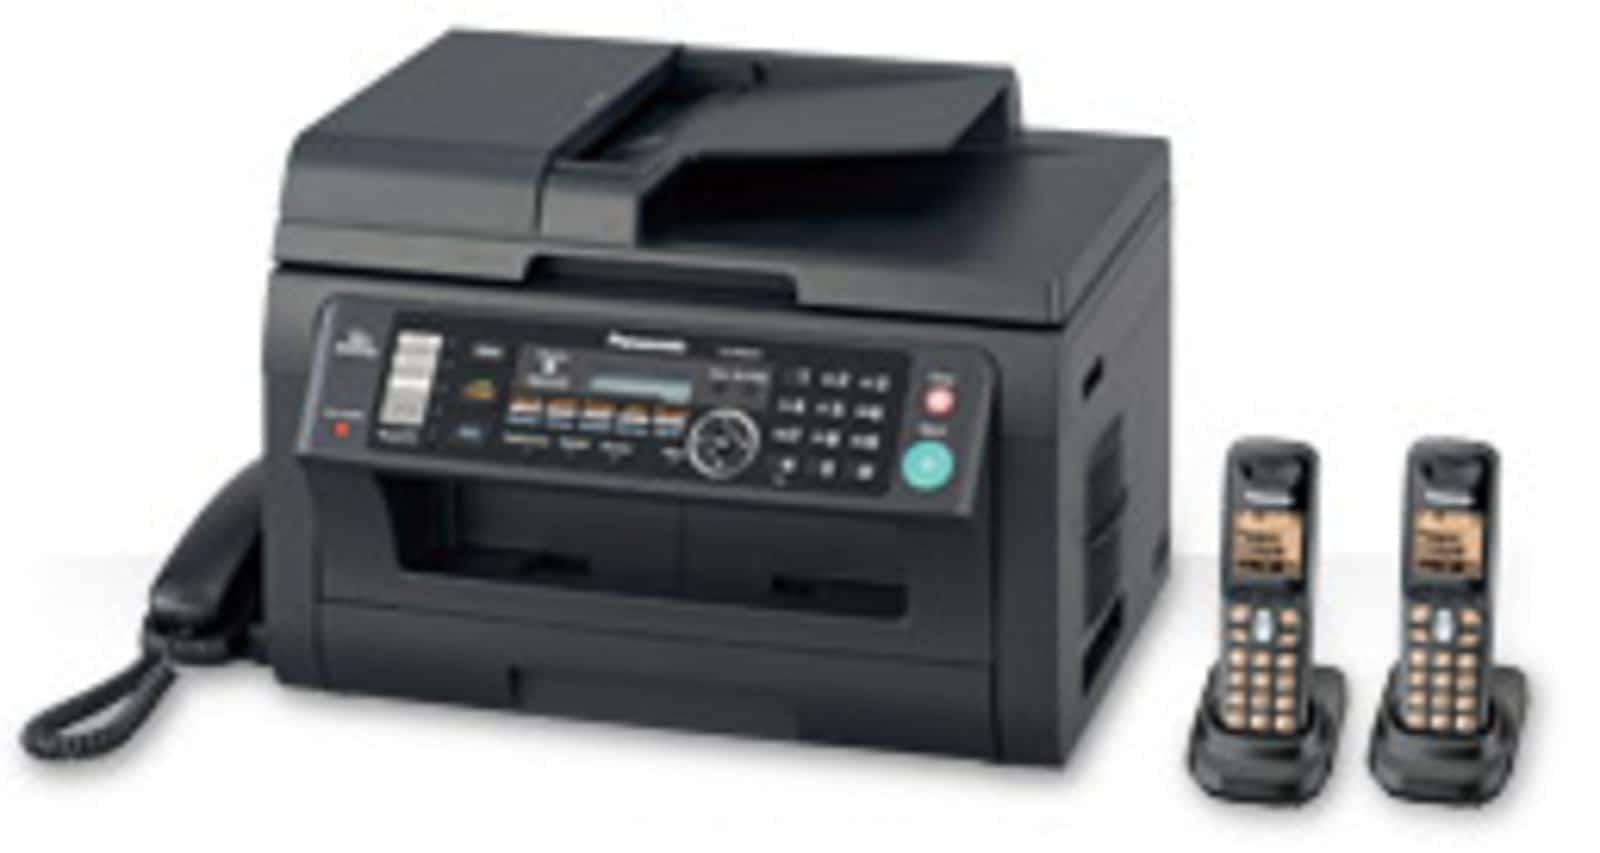 richmond copiers stones va service beauty s full equipment mx stone and office printers